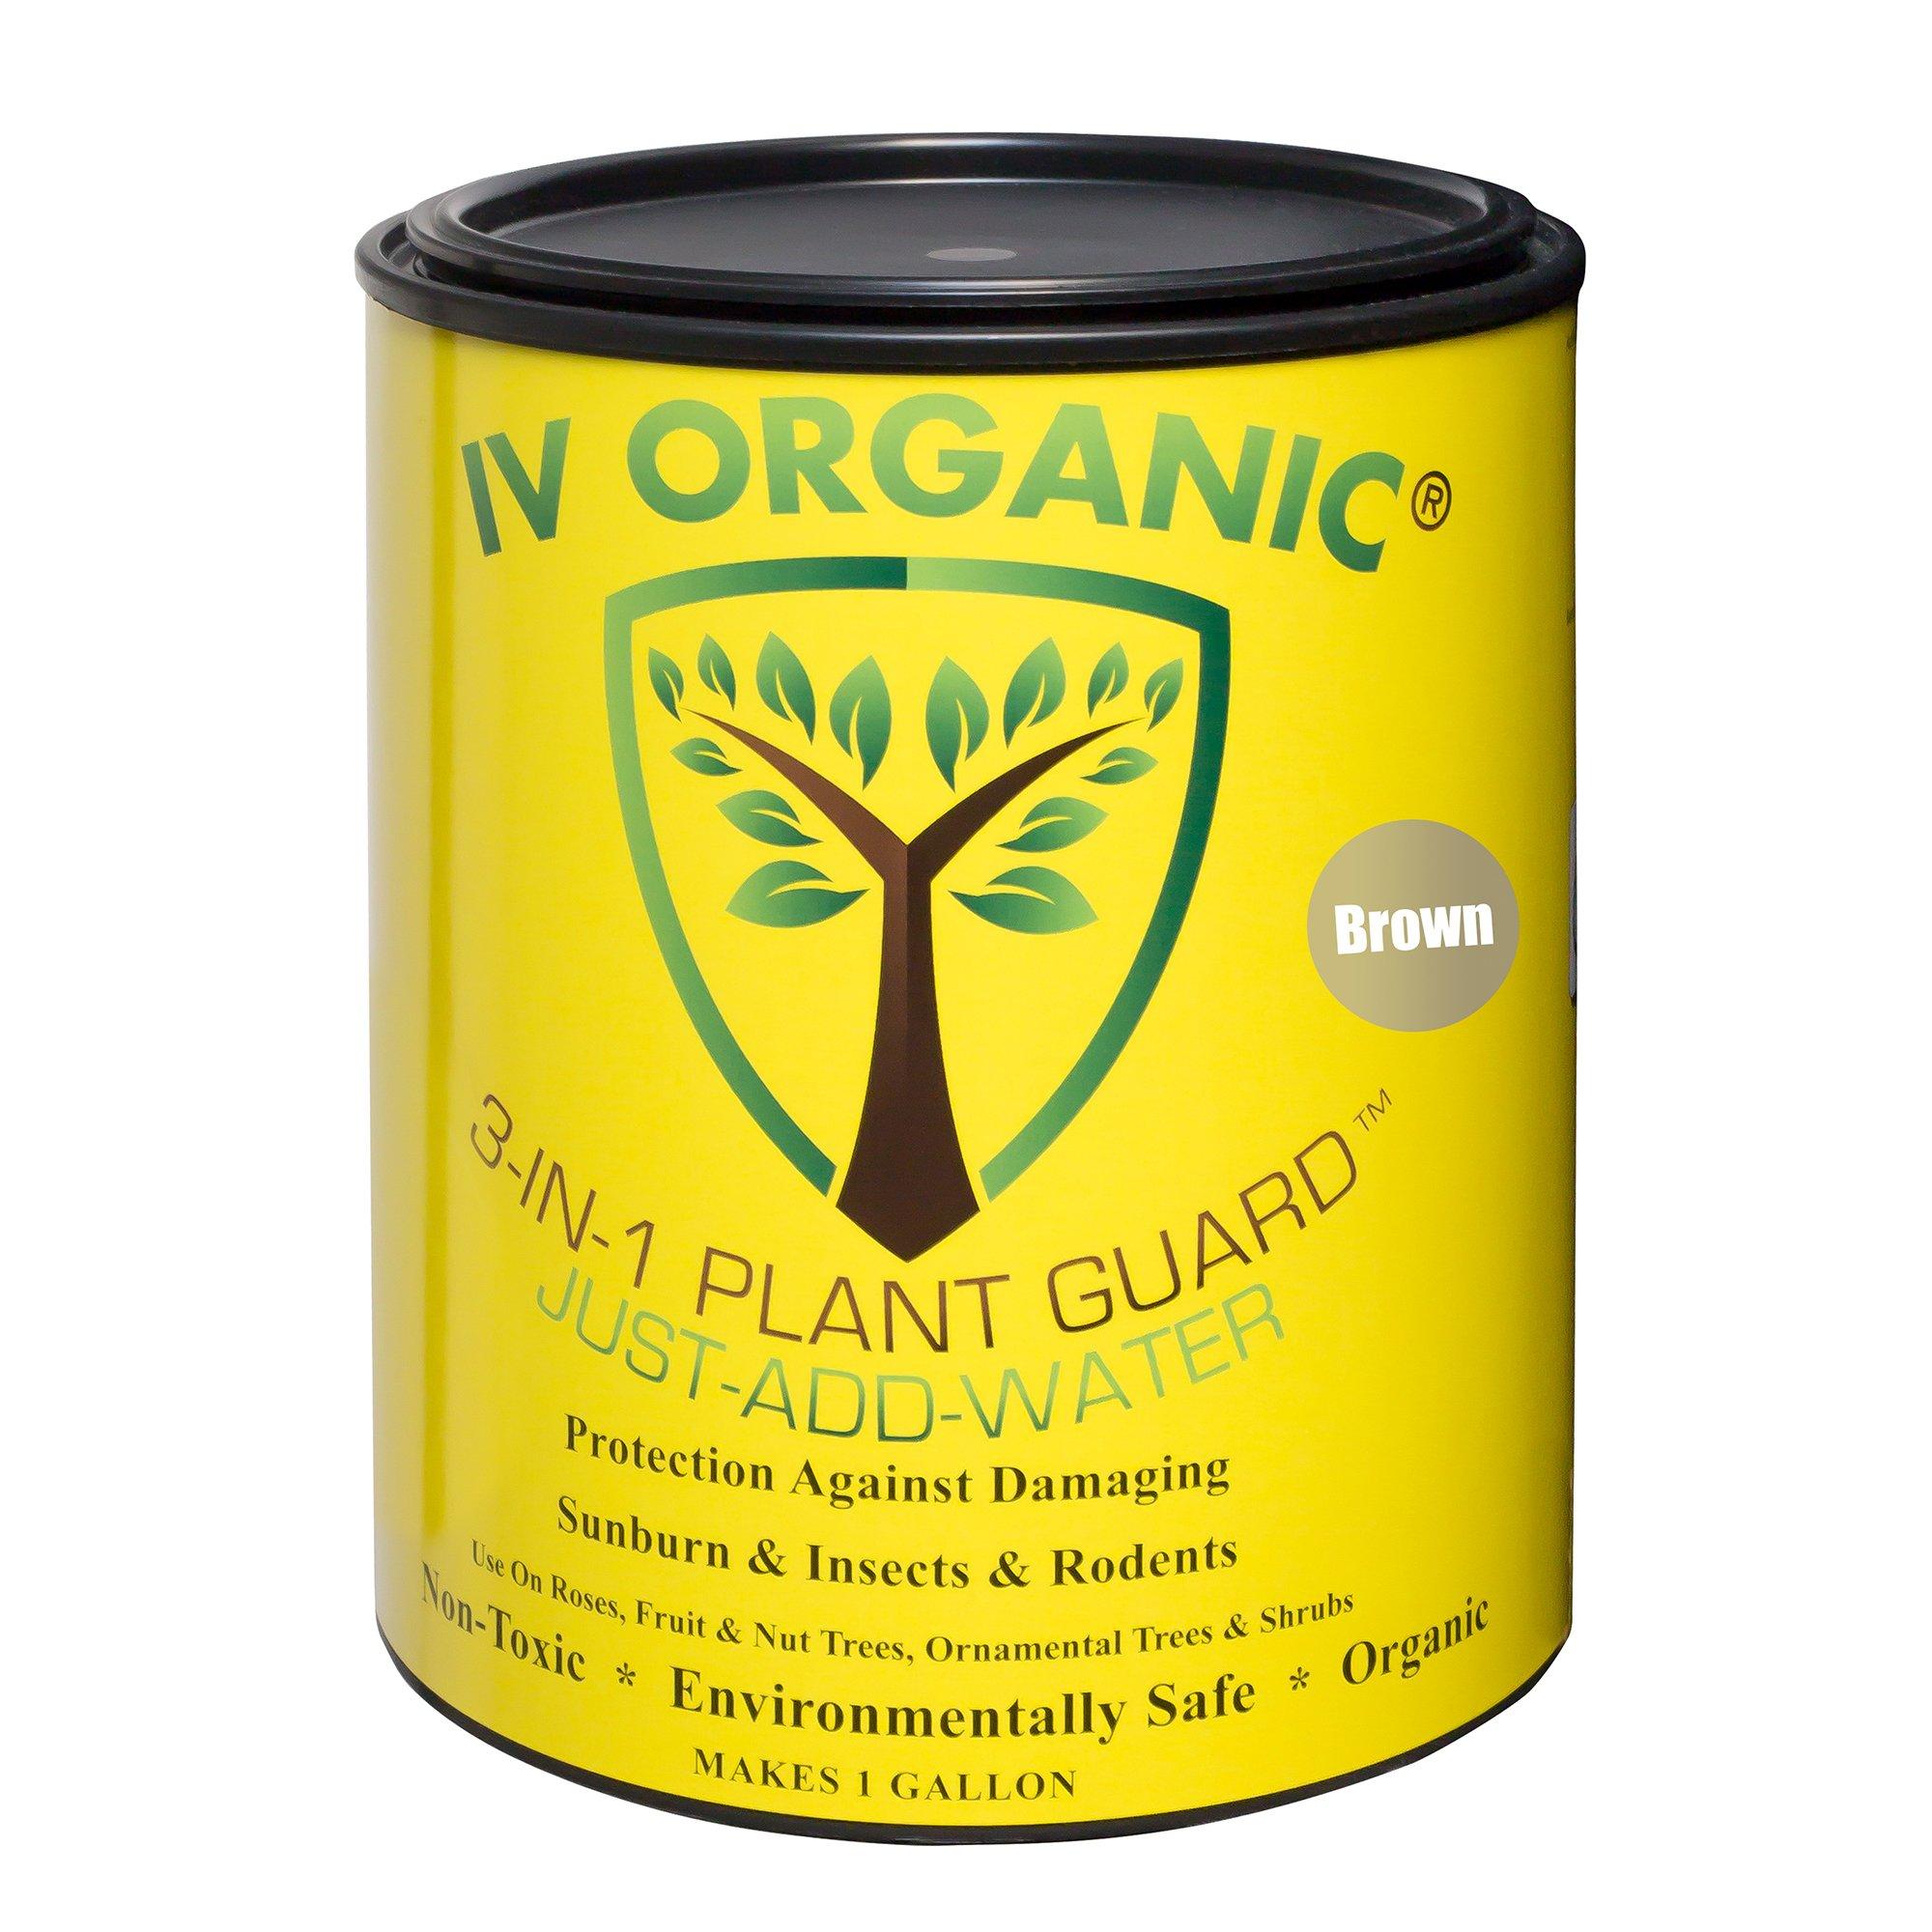 IV Organic 100534644 3-in-1 Plant Guard Brown 1gal